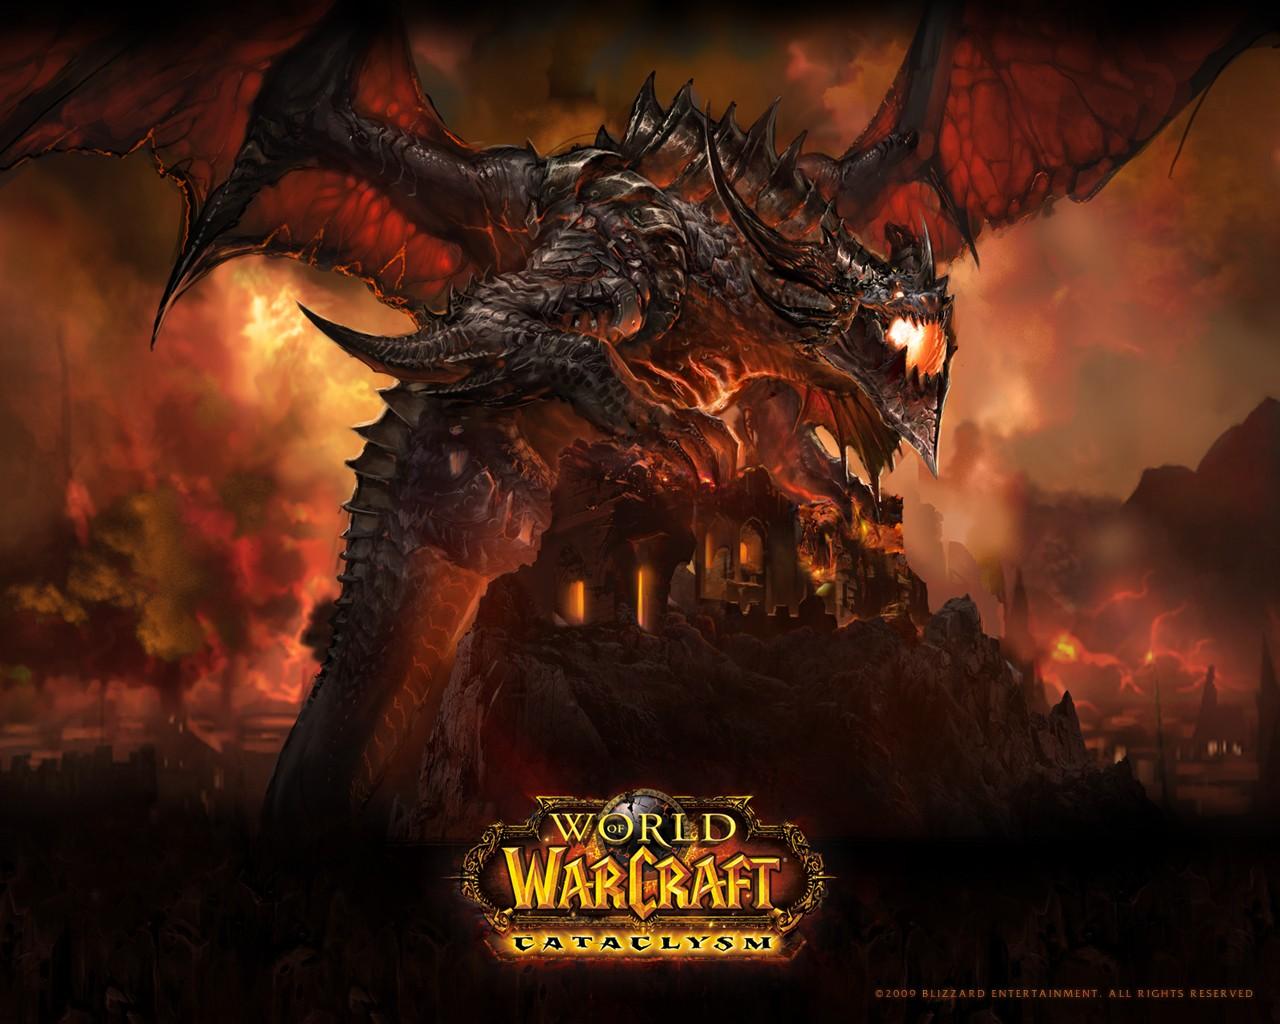 Дракон над крепостью 1280x1024 255KB World of WarCraft